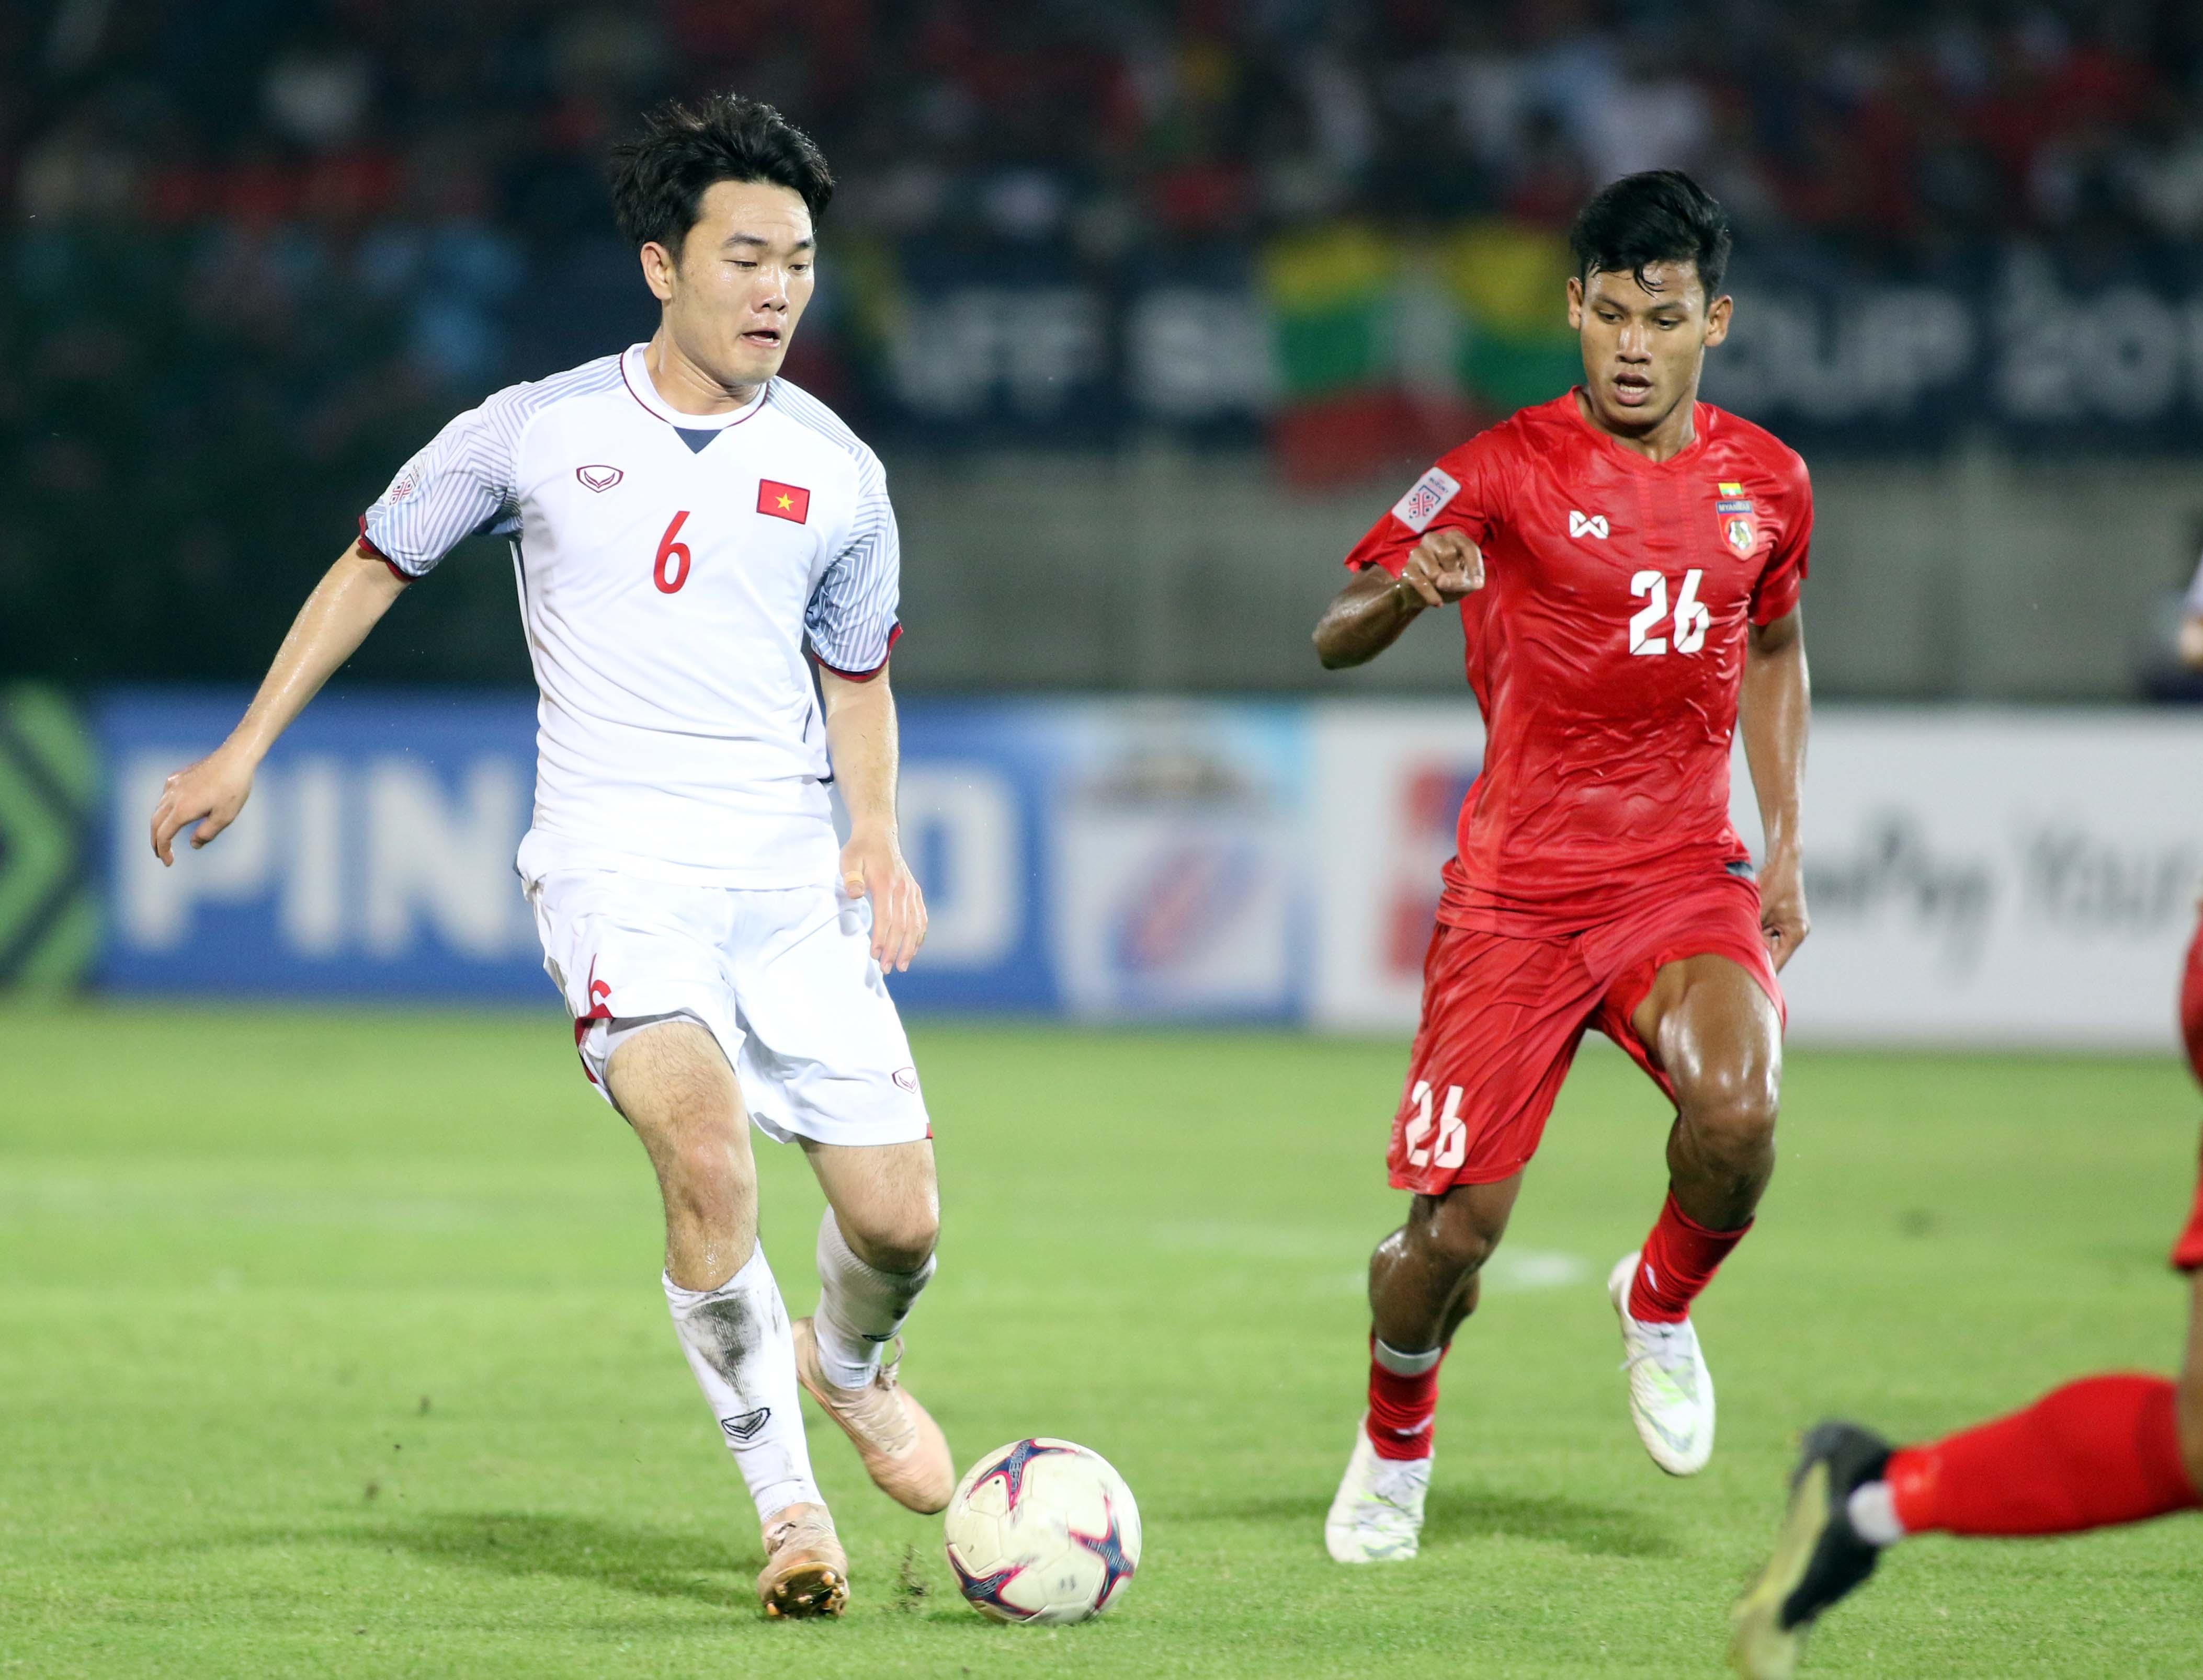 Xuân Trường 3 - Myanmar vs Vietnam AFF Suzuki Cup 2018